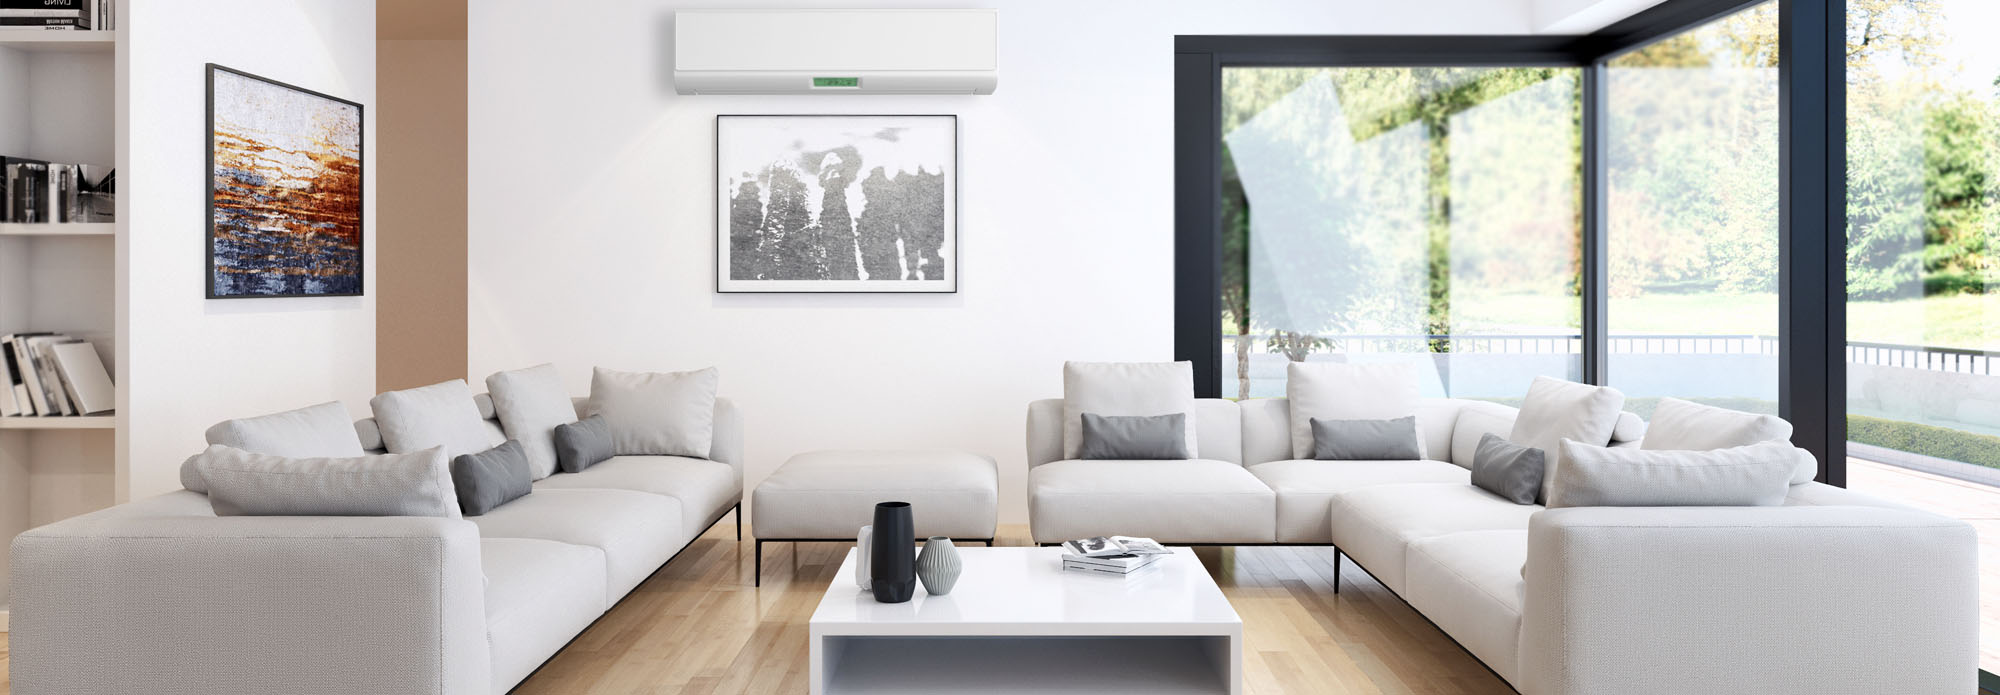 Residential Air Conditioning Installation Brisbane